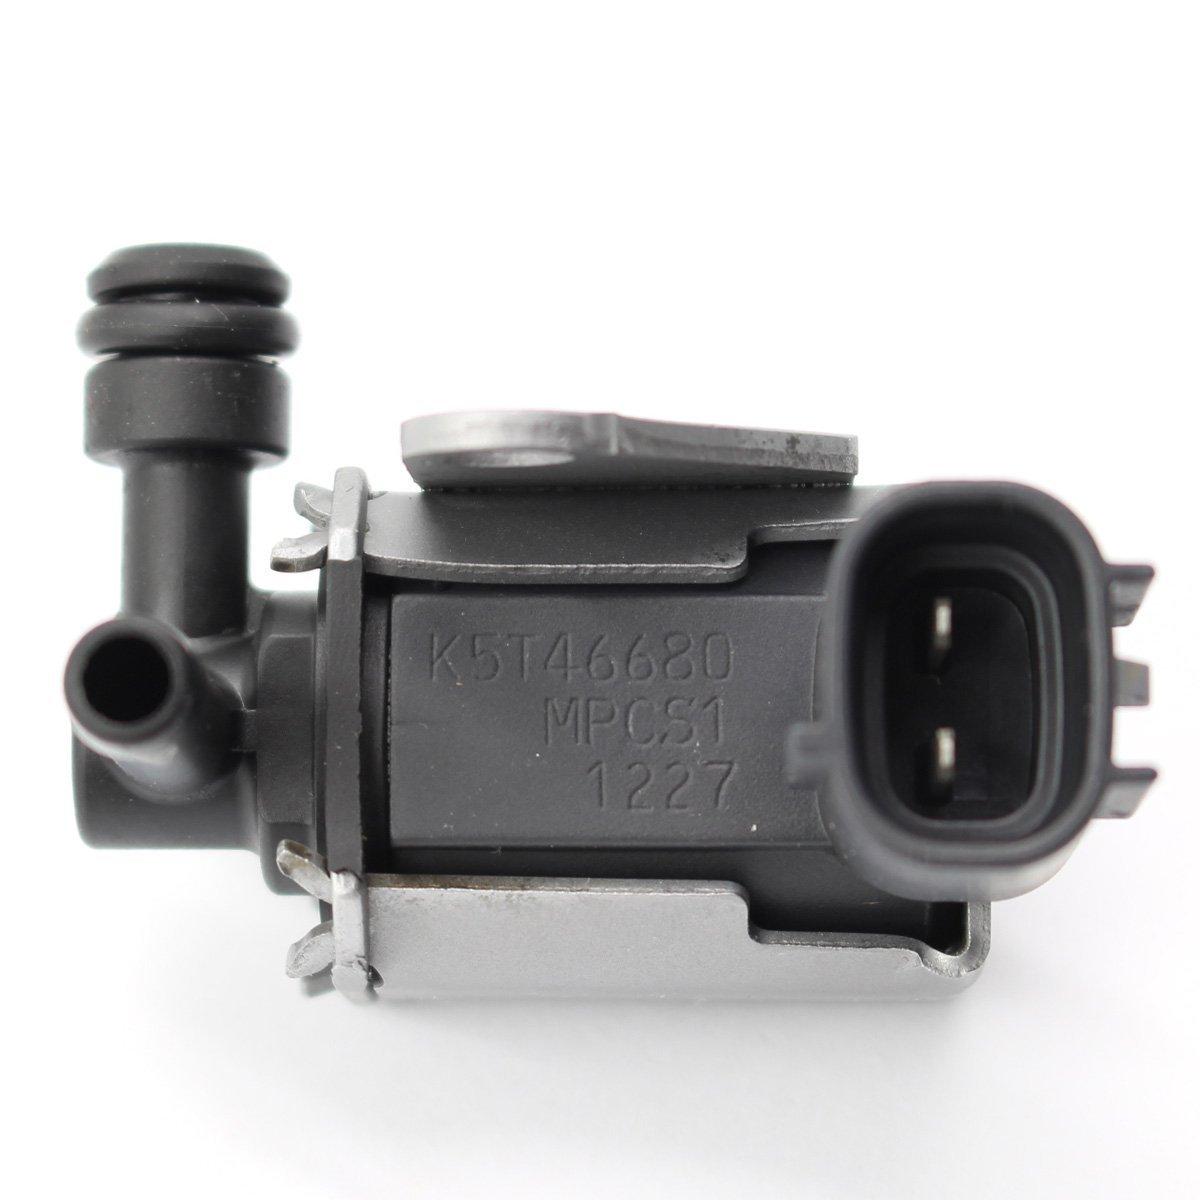 Triumilynn Vapor Canister Purge Control Solenoid Valve K5T46680 Fits Honda Civic CR-V 36162 RUIAHC